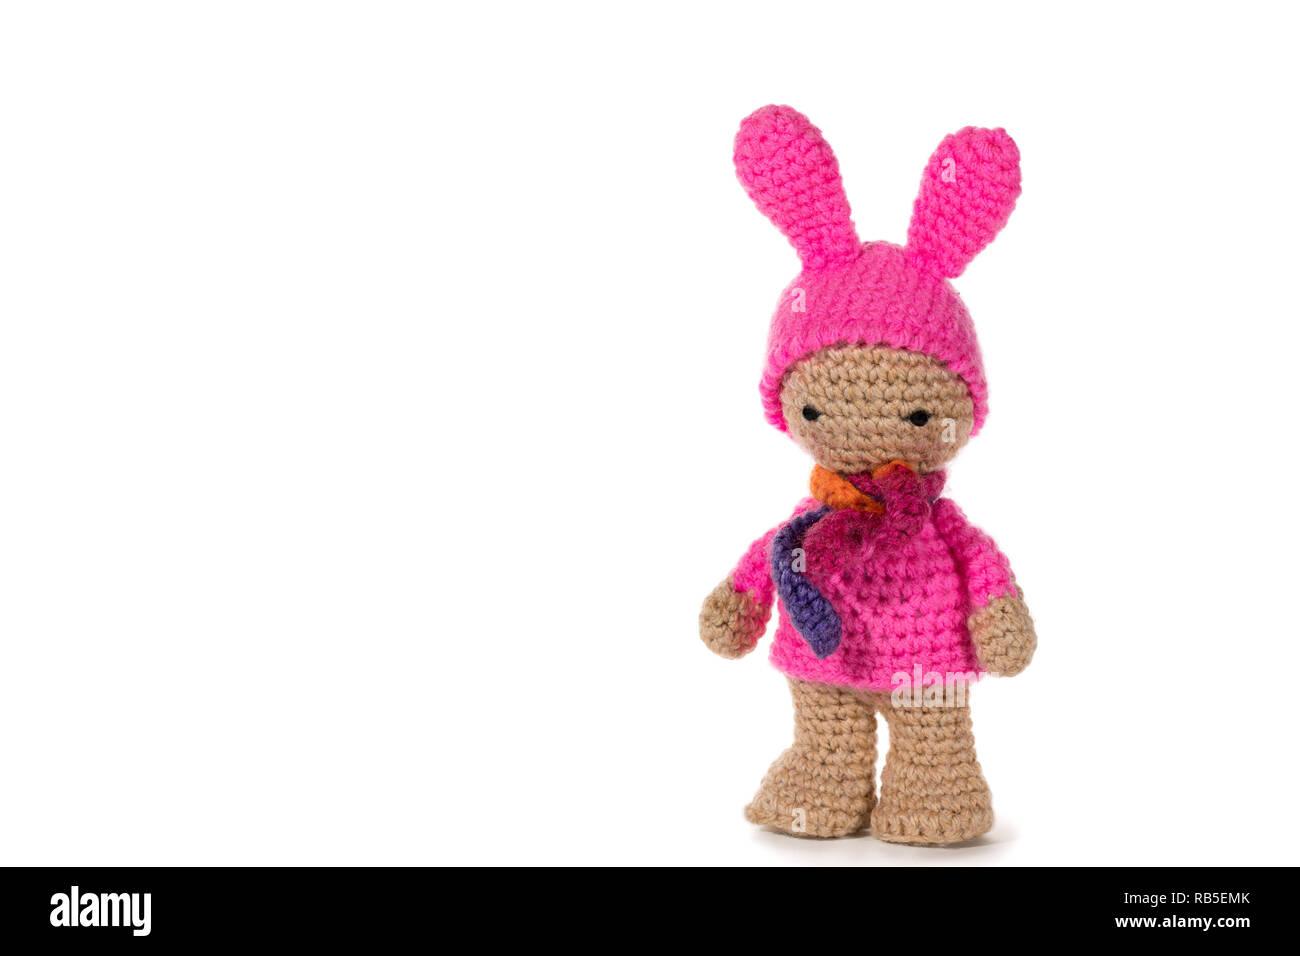 Make It: Dress Up Bunny - Free Crochet Pattern #crochet #amigurumi ... | 956x1300